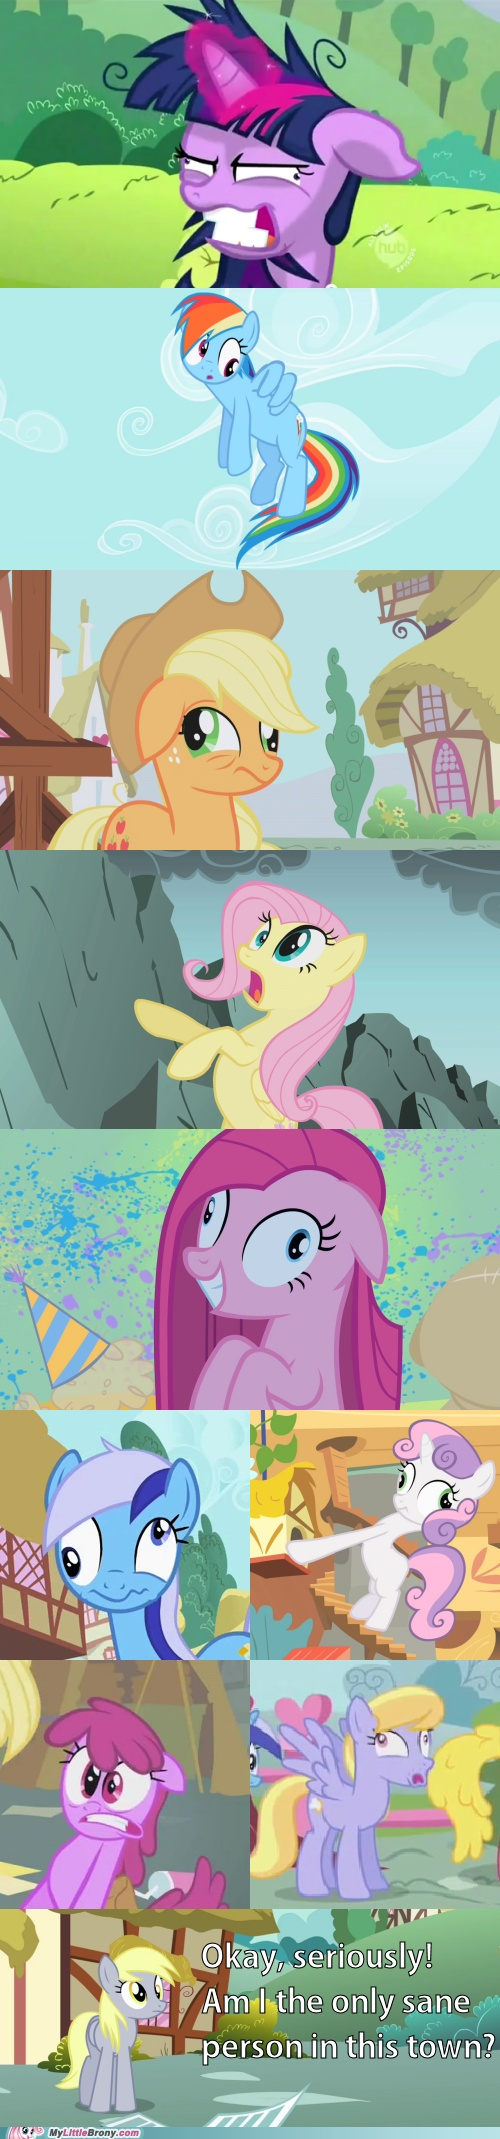 my little pony, friendship is magic, only sane pony